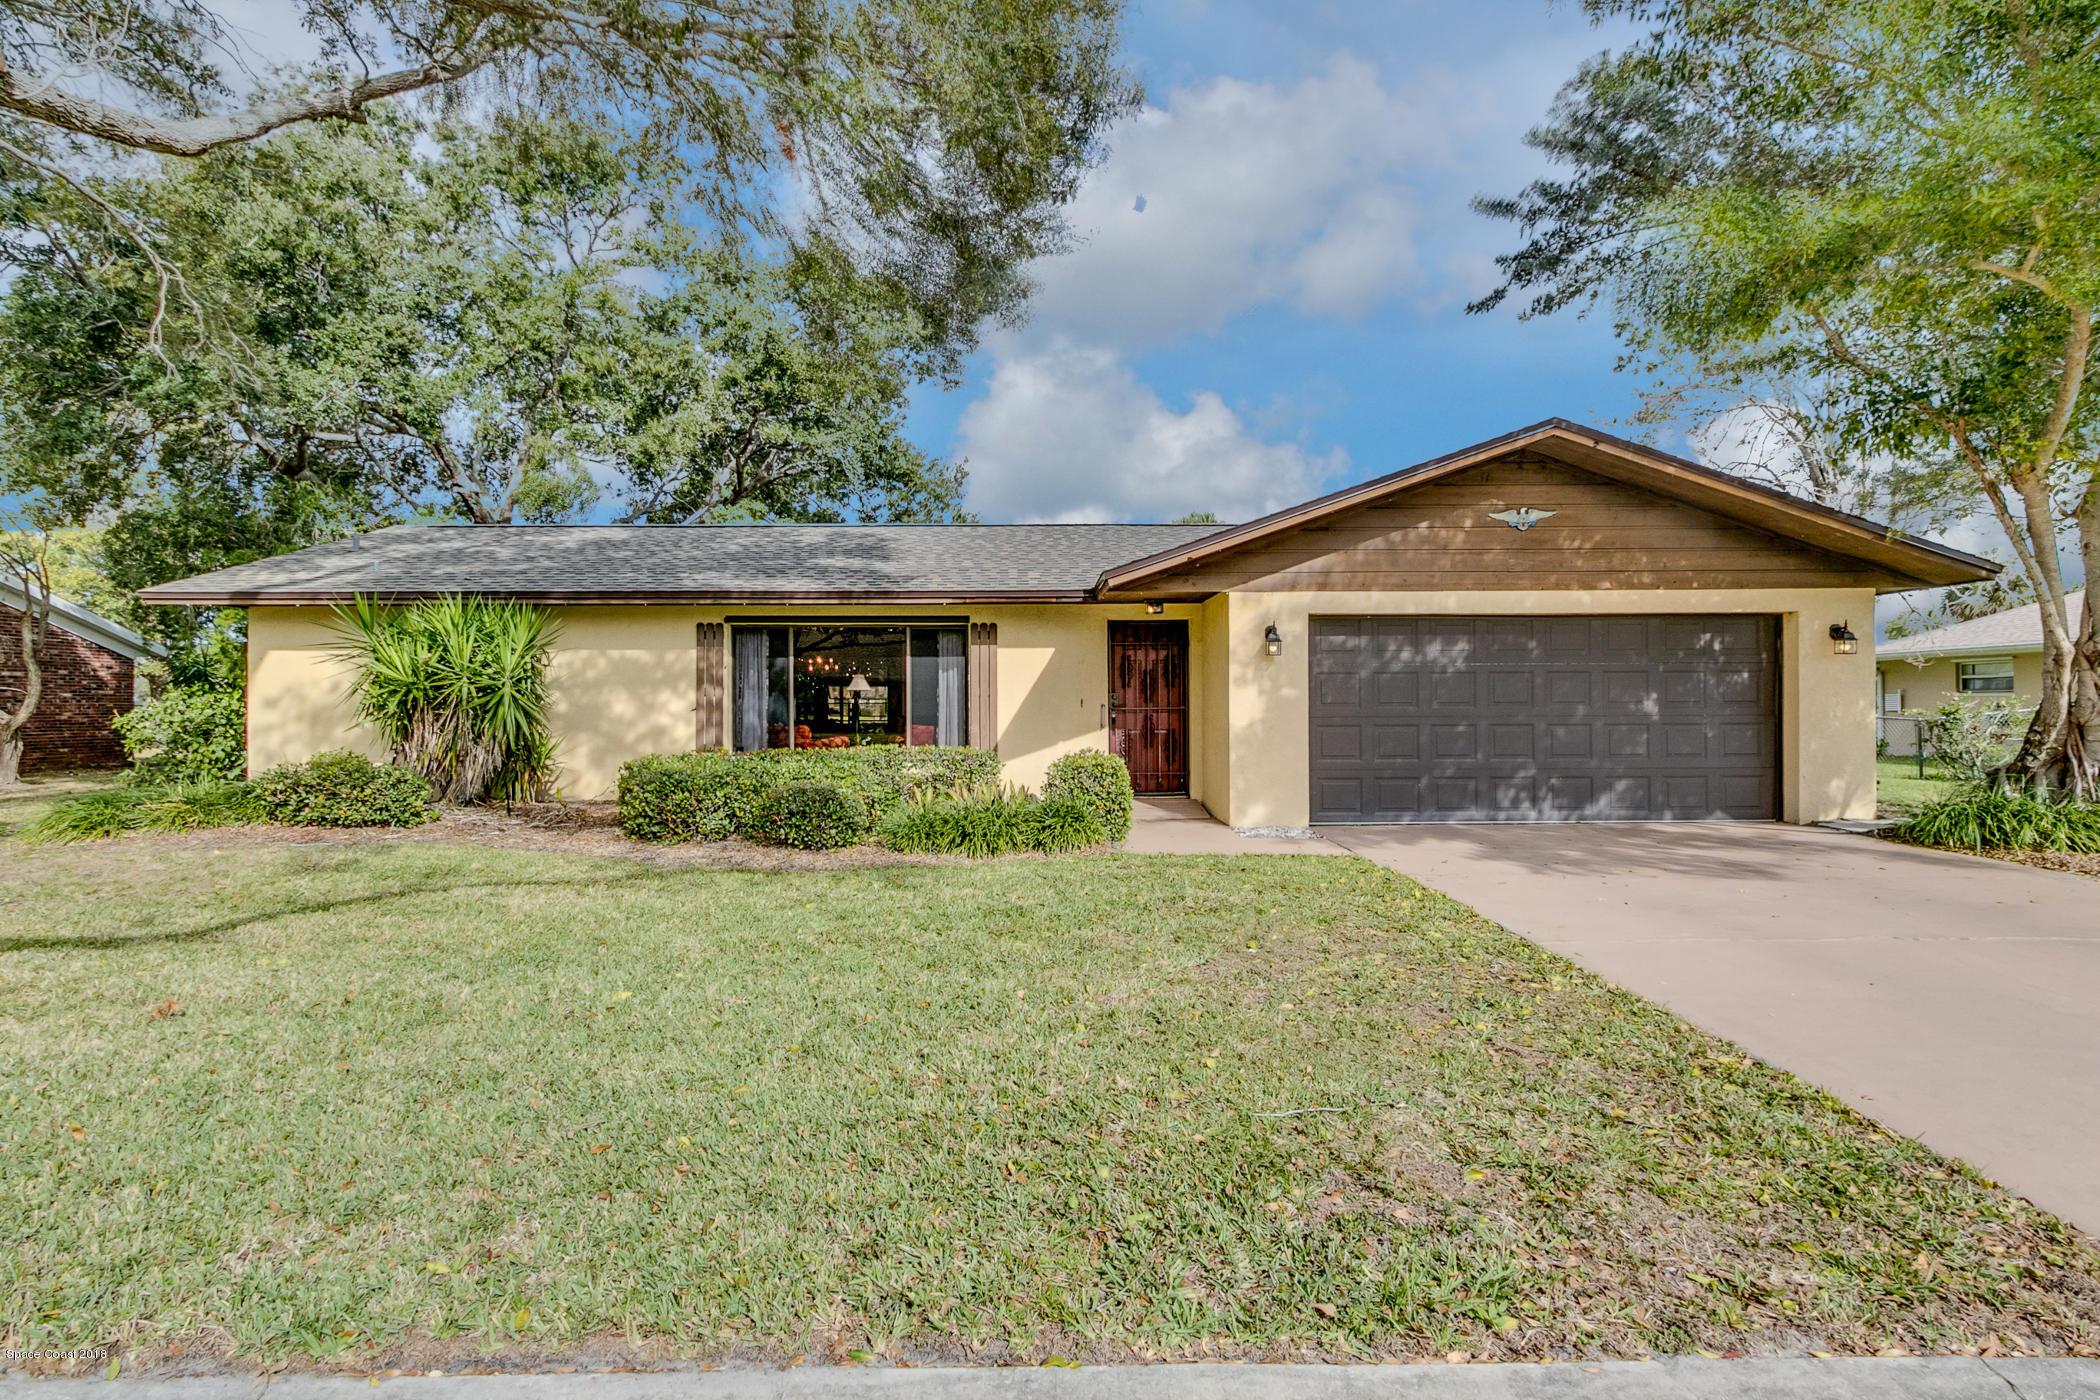 Single Family Home for Sale at 2650 Bernice 2650 Bernice Melbourne, Florida 32935 United States